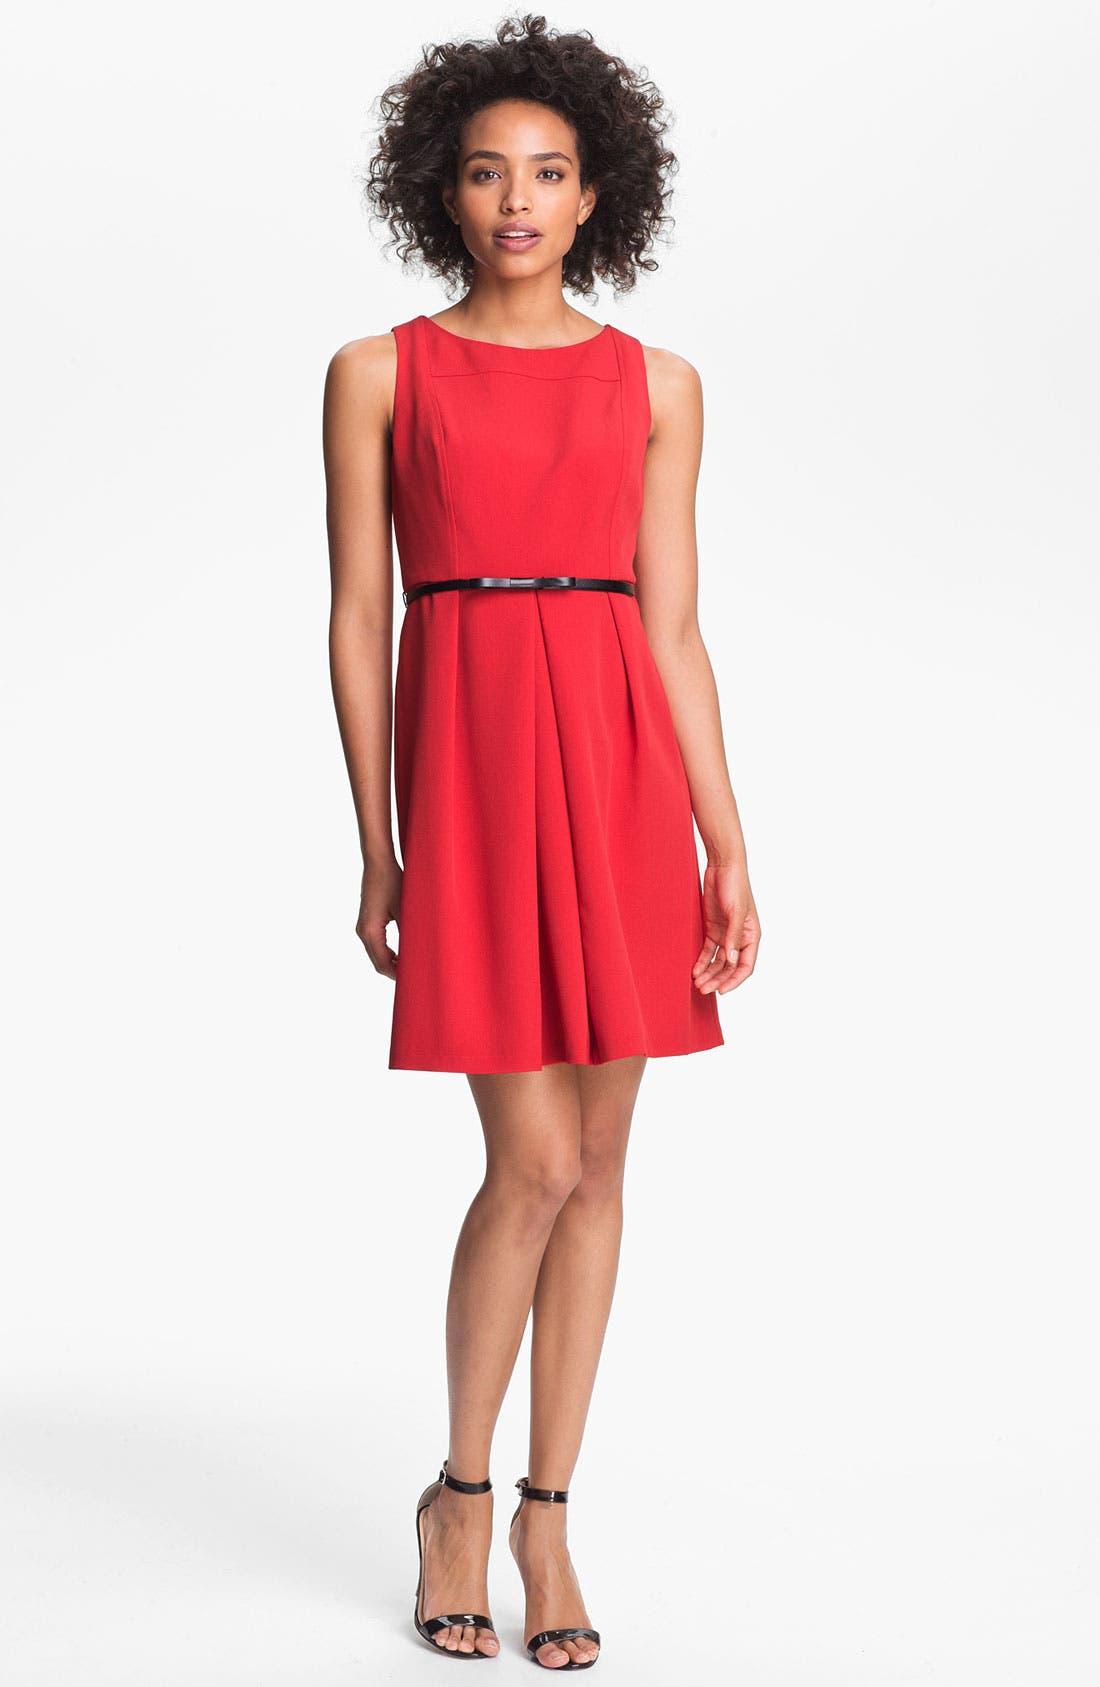 ADRIANNA PAPELL Seamed A-Line Dress, Main, color, 600